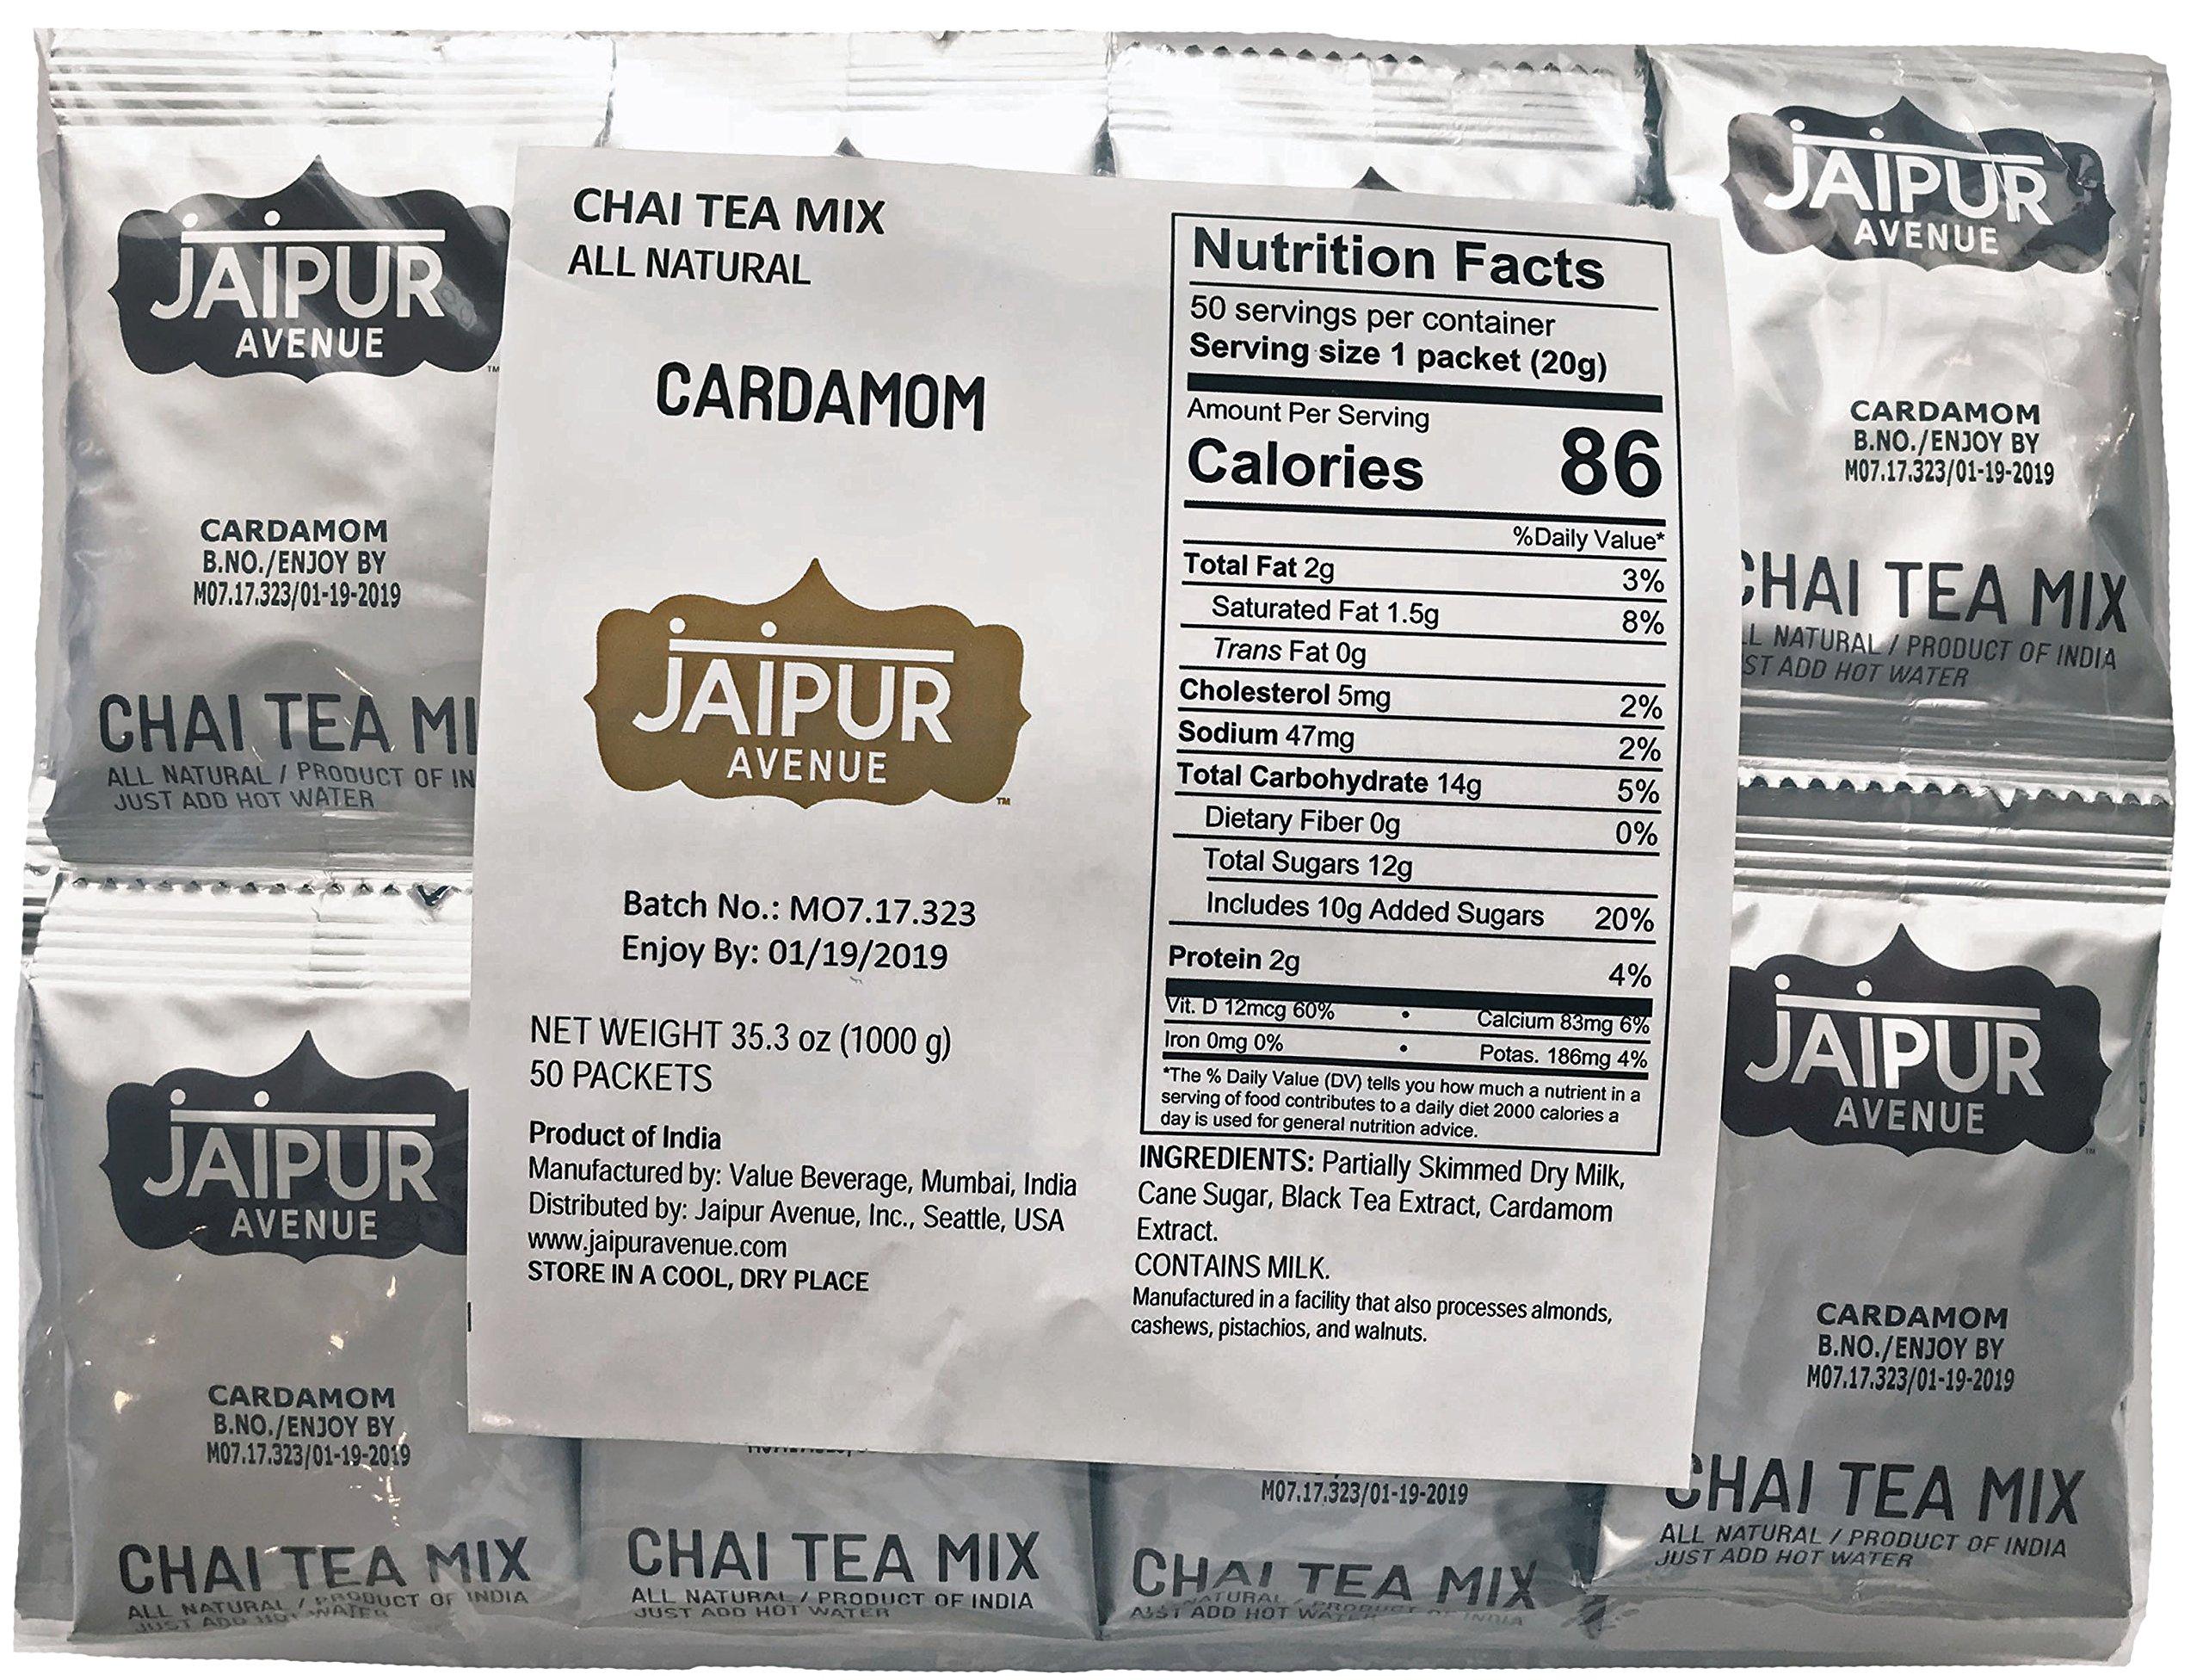 Jaipur Avenue Chai Tea Mix Cardamom (50-Count Bag) by Jaipur Avenue